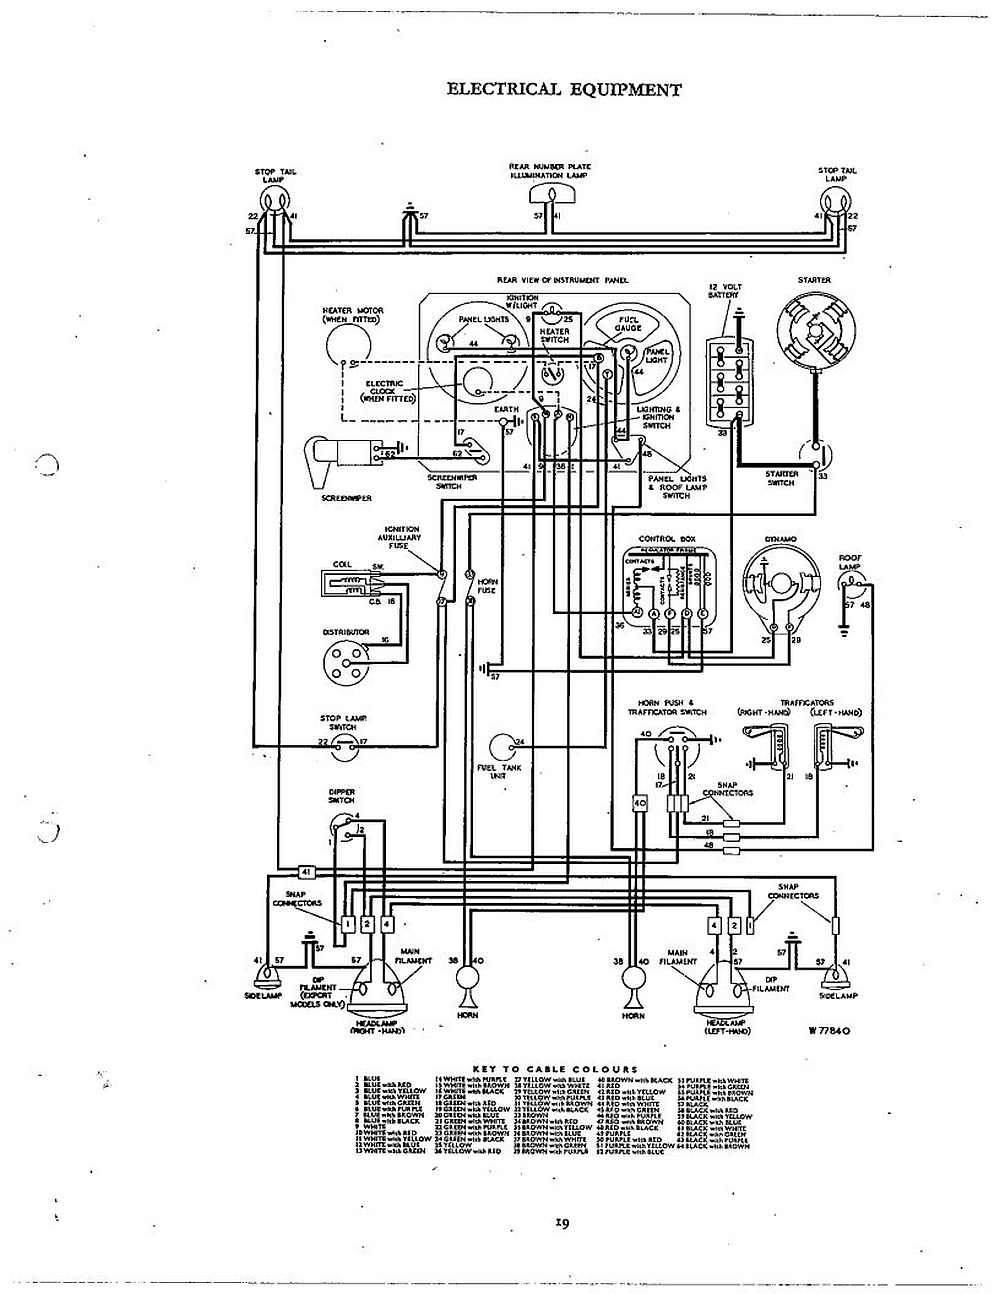 1973 triumph bonneville wiring diagram   38 wiring diagram